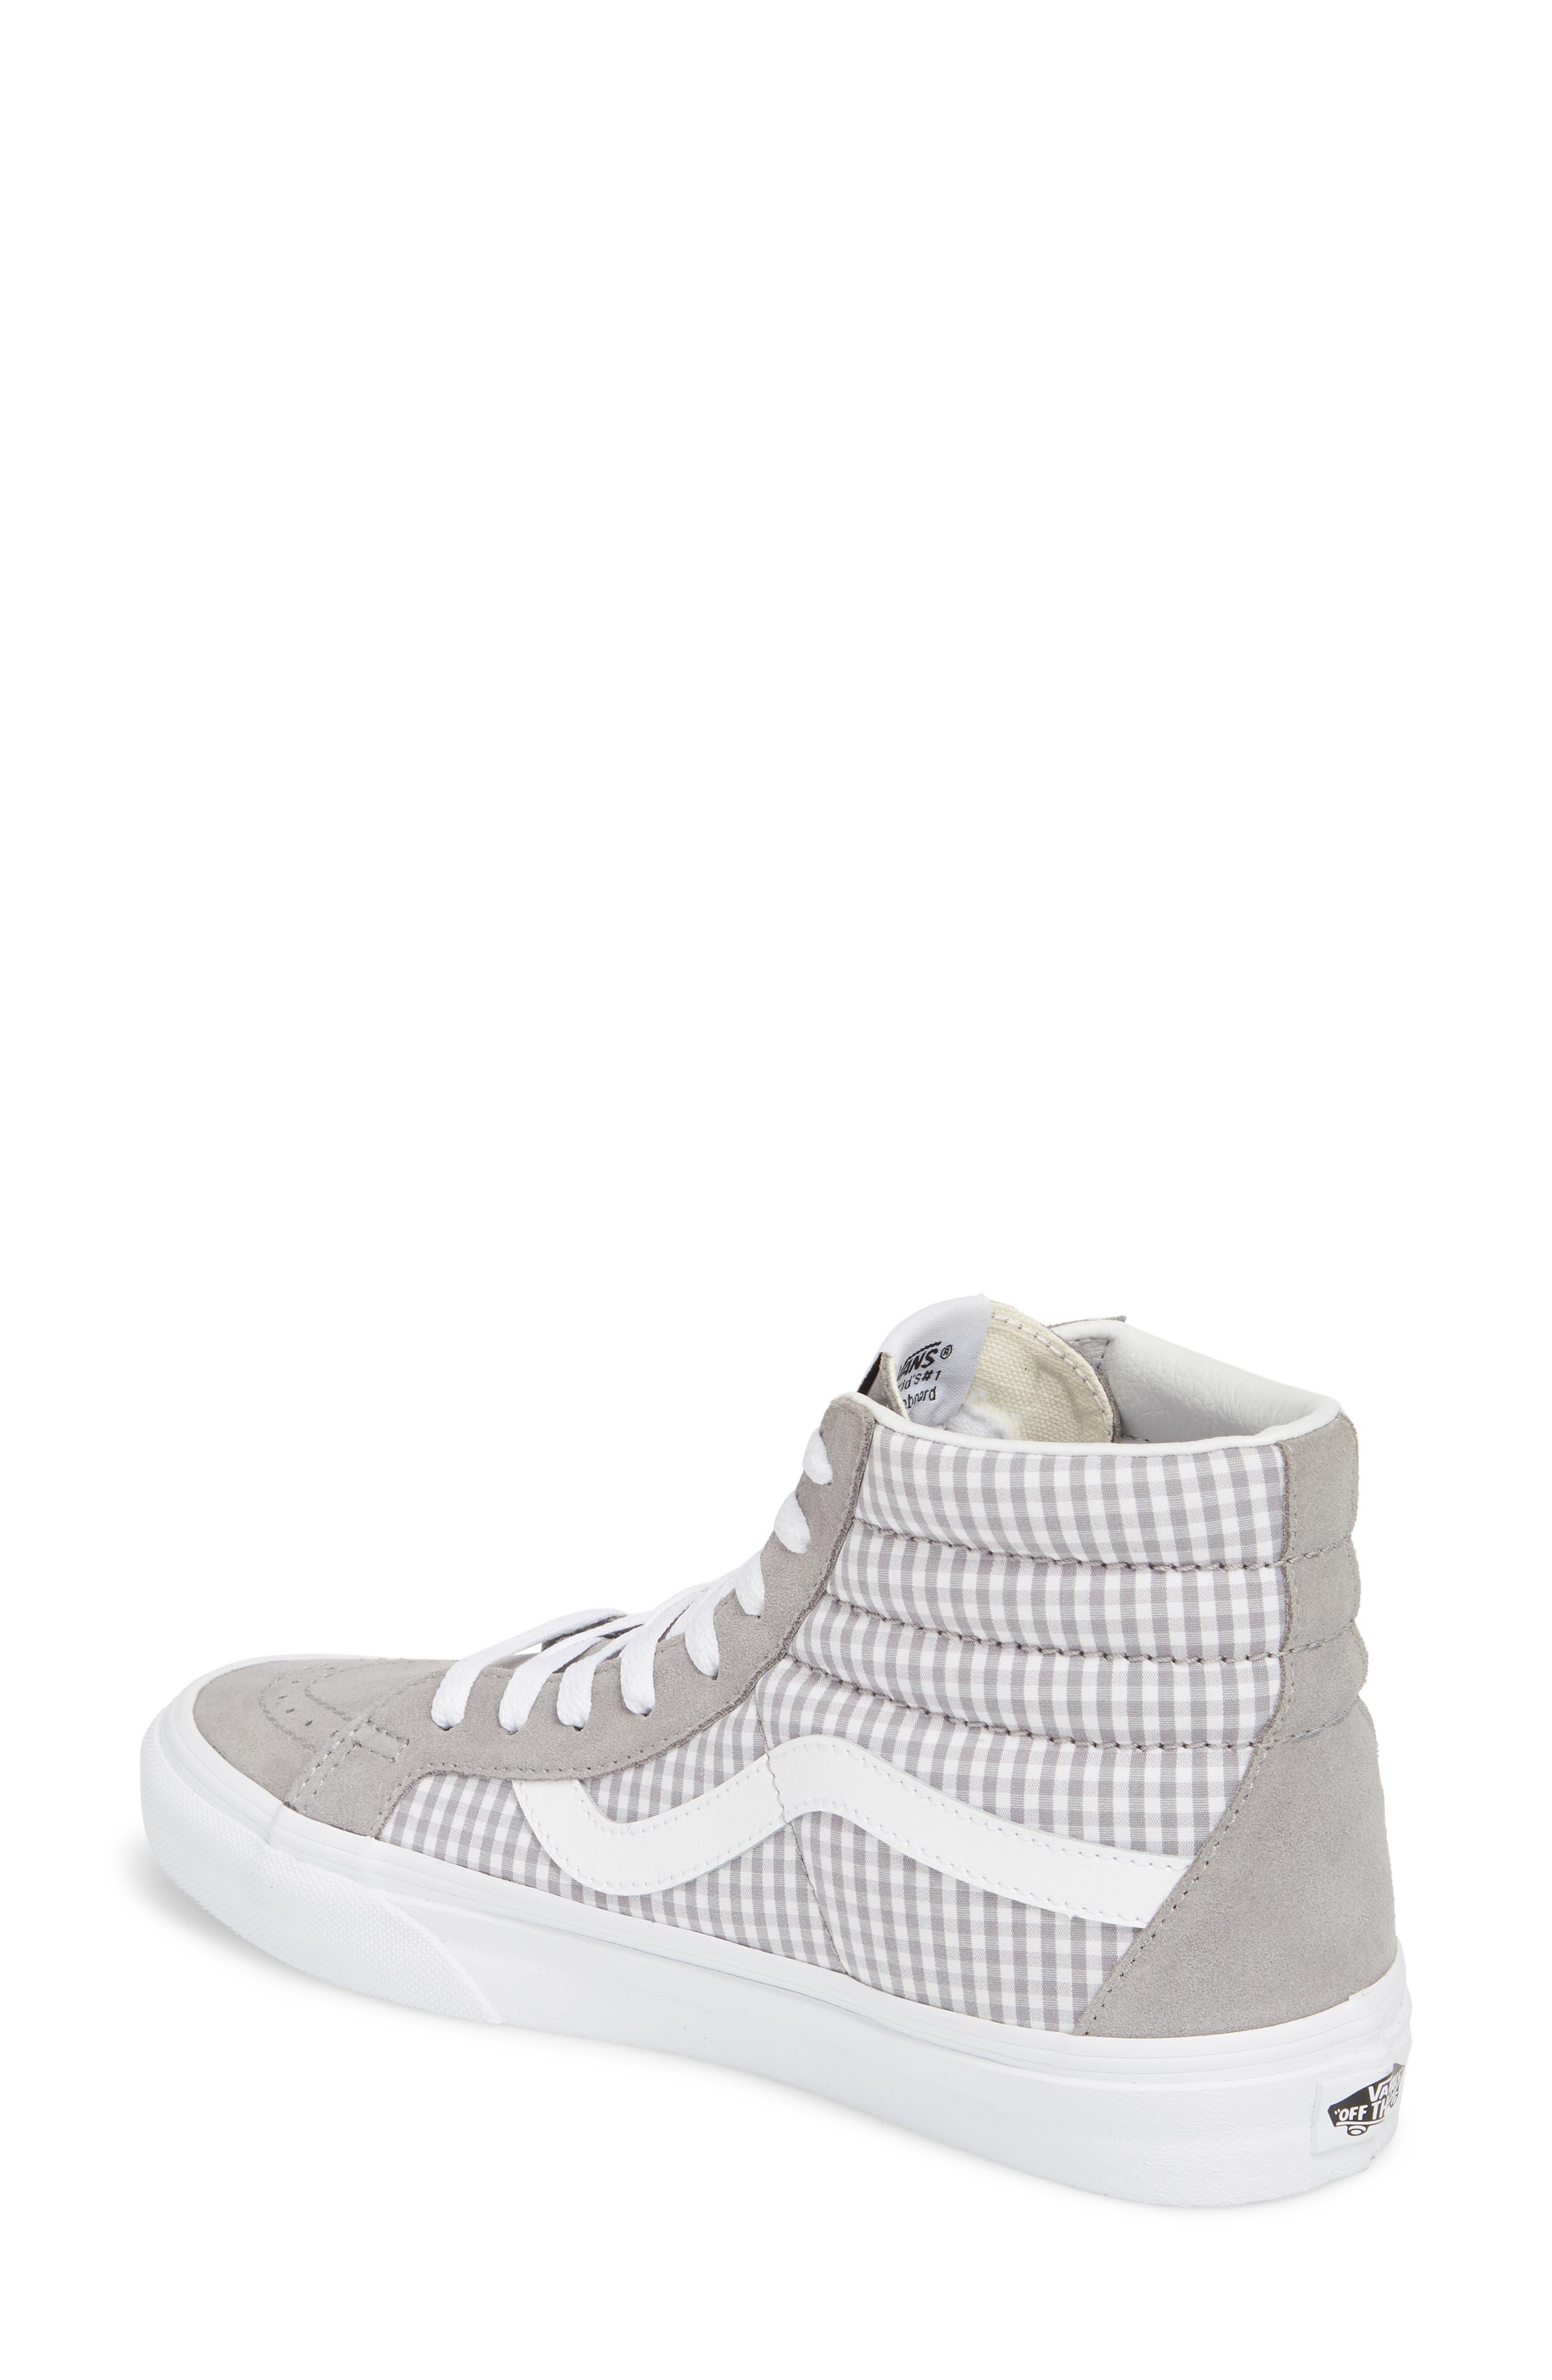 'Sk8-Hi Reissue' Sneaker,                             Alternate thumbnail 2, color,                             Titanium/ True White